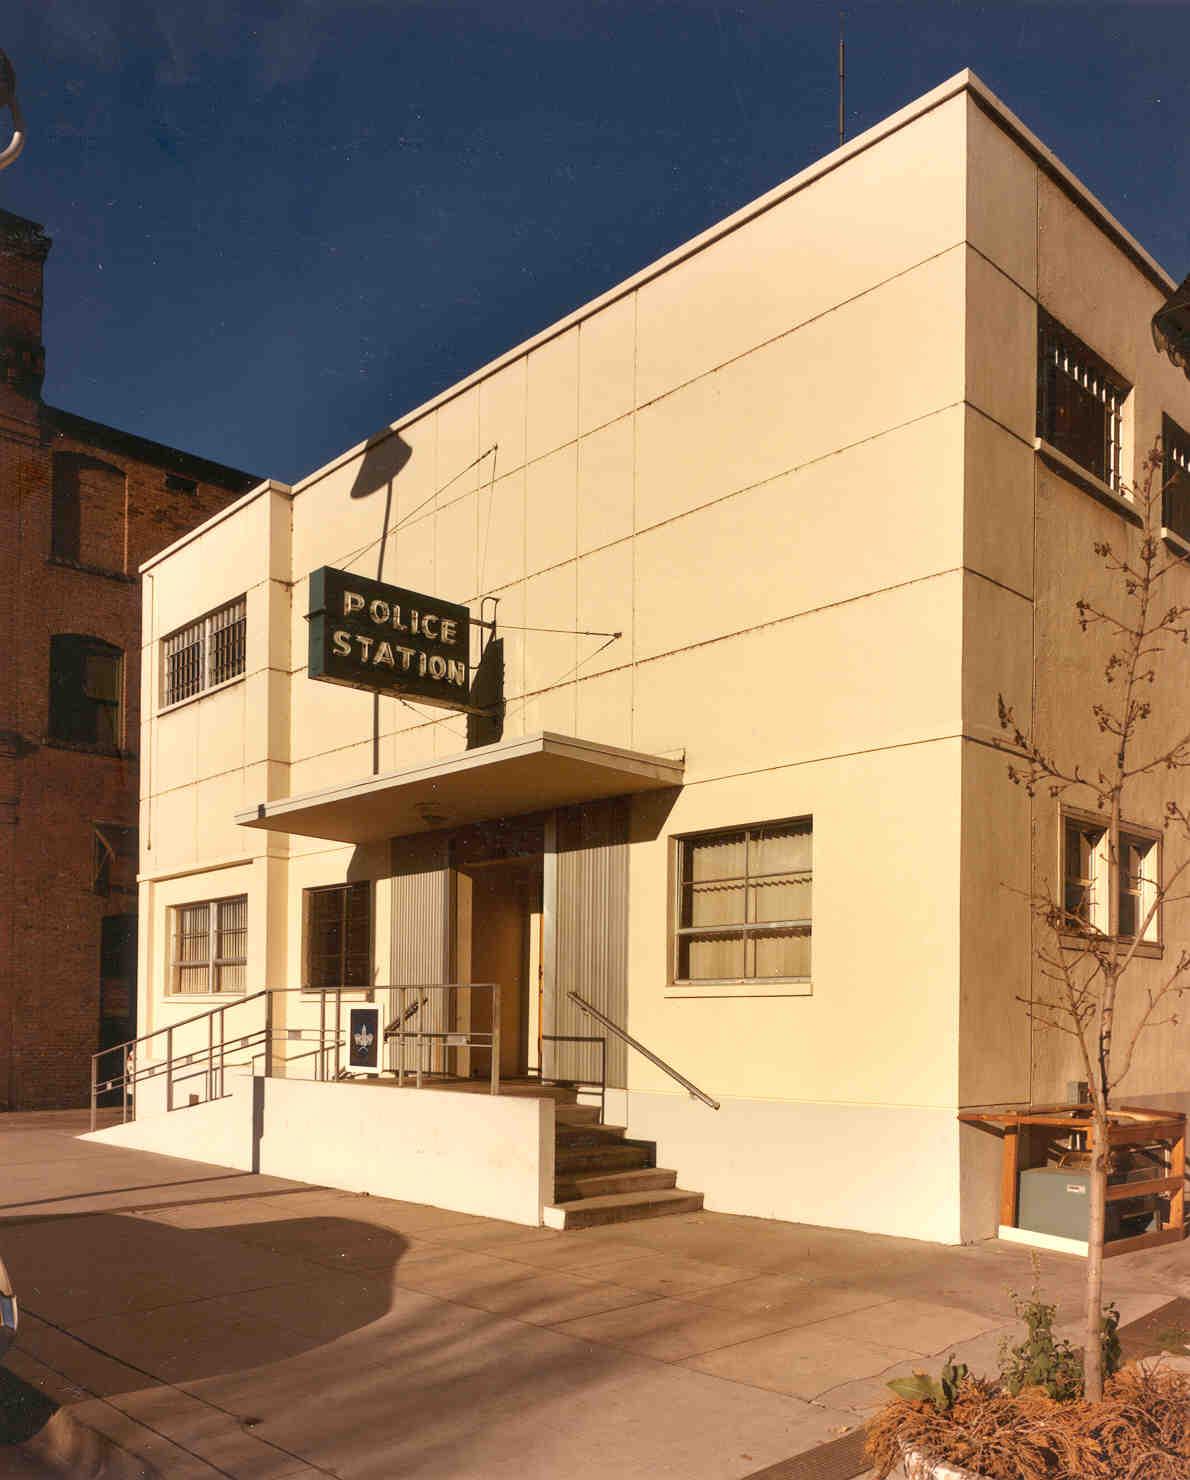 Police Station : 1953 -